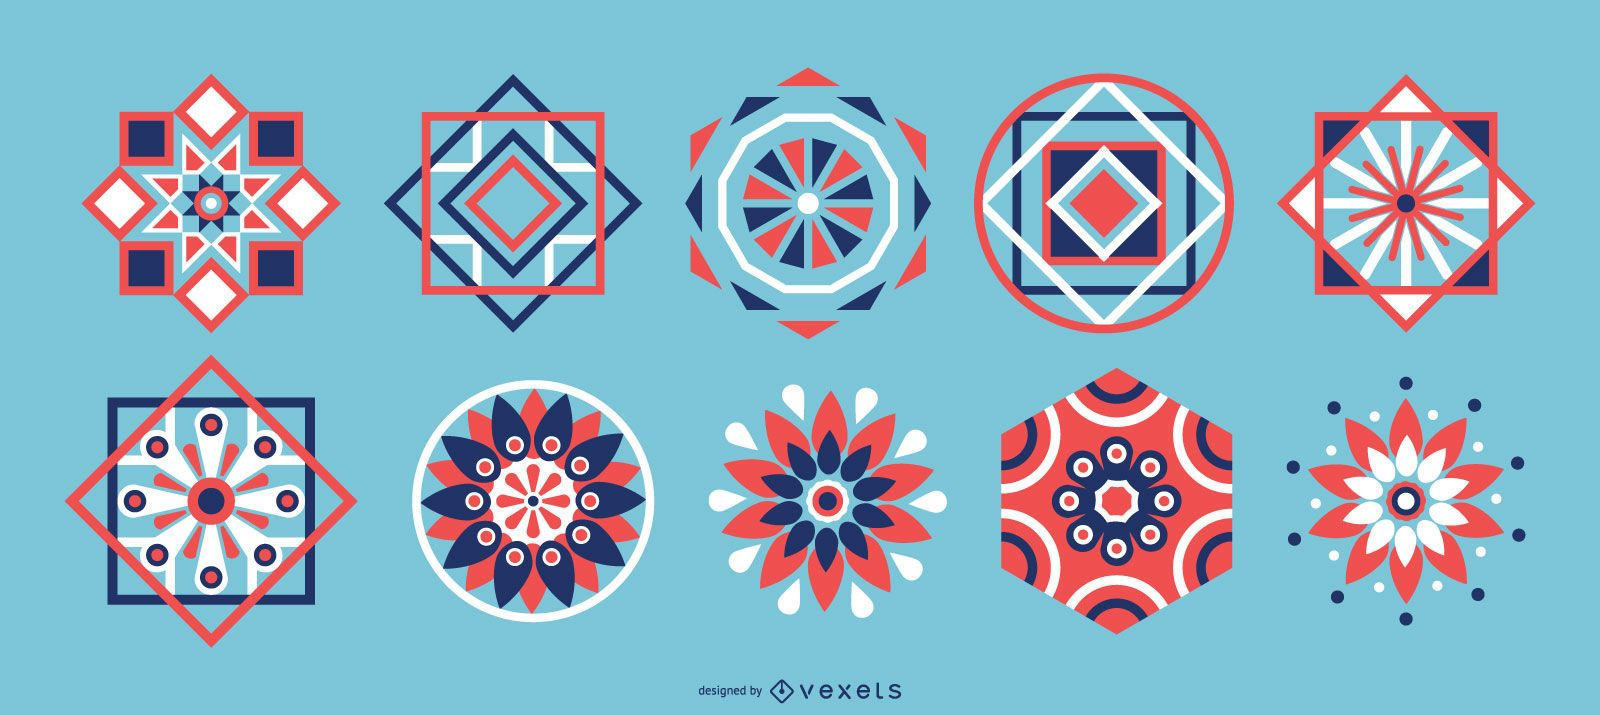 Arabic Geometric Colored Elements Pack